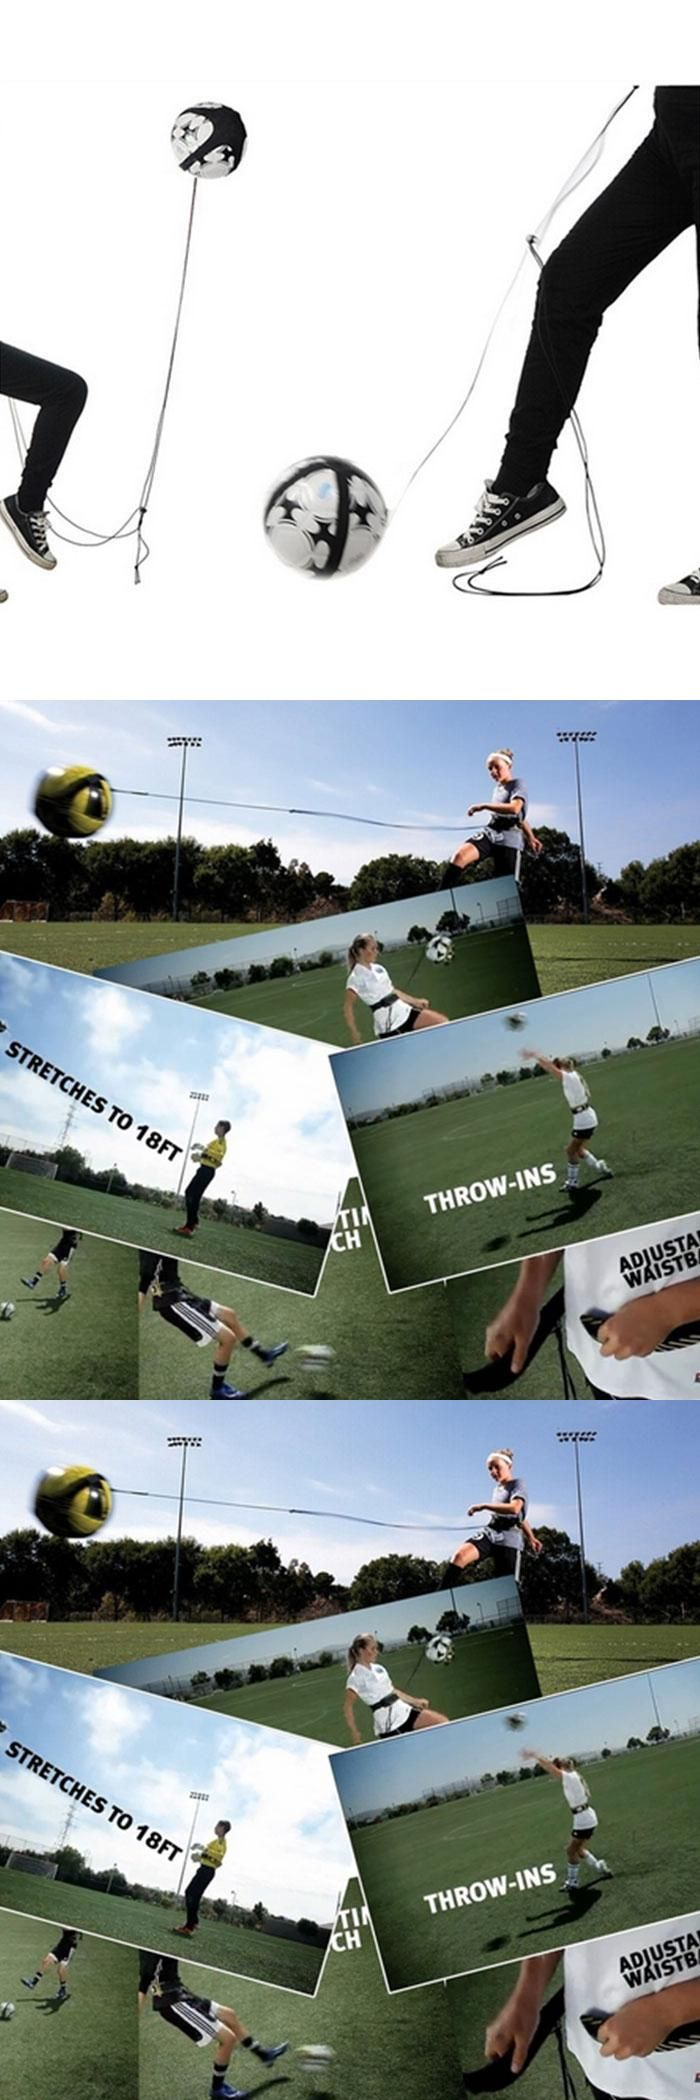 [Visit to Buy] Football Kick Trainer Skills Solo Soccer Training Aid Equipment WaistBelt #Advertisement